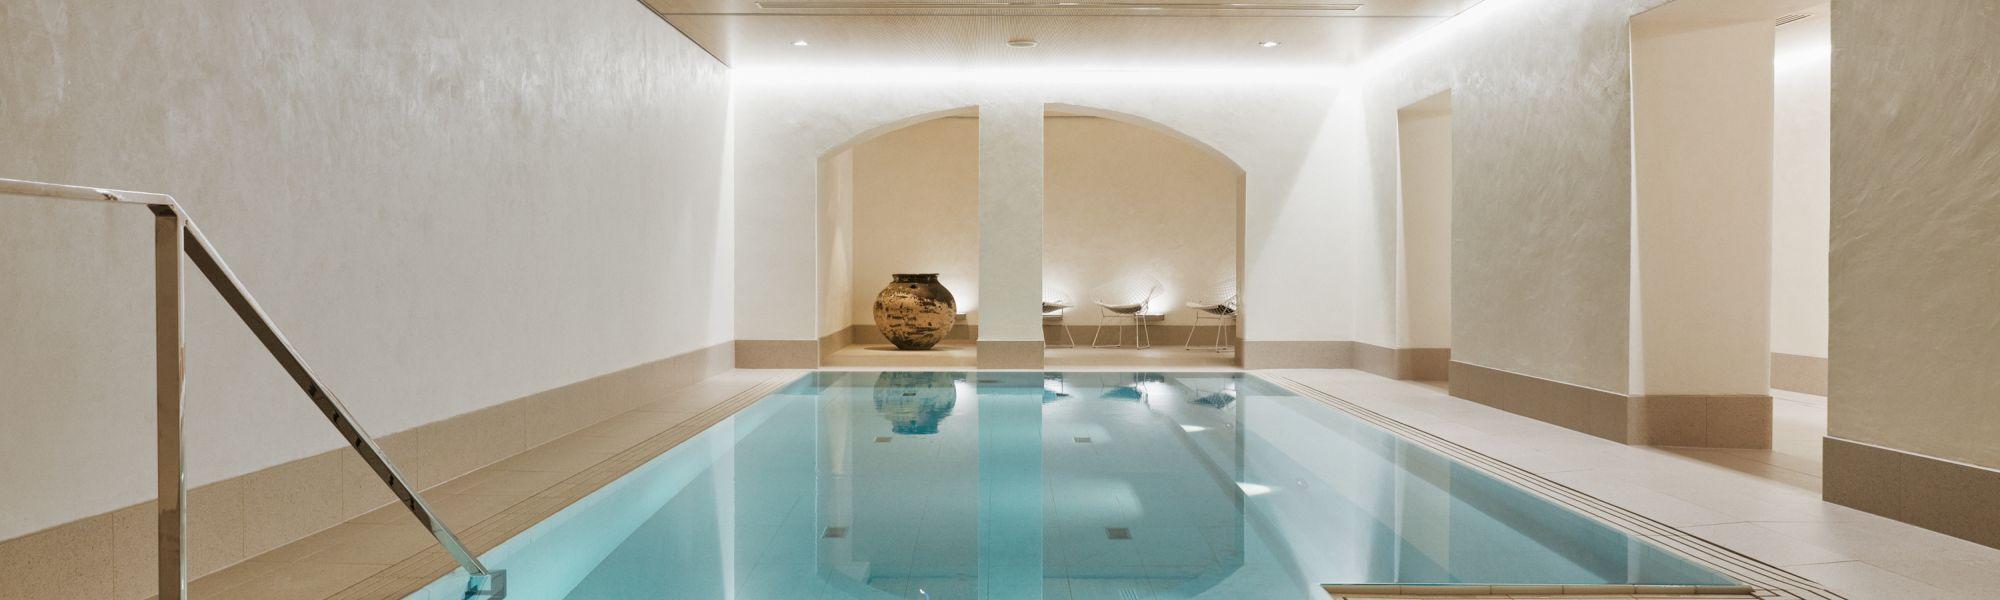 Luxurious spa in Helsinki city center